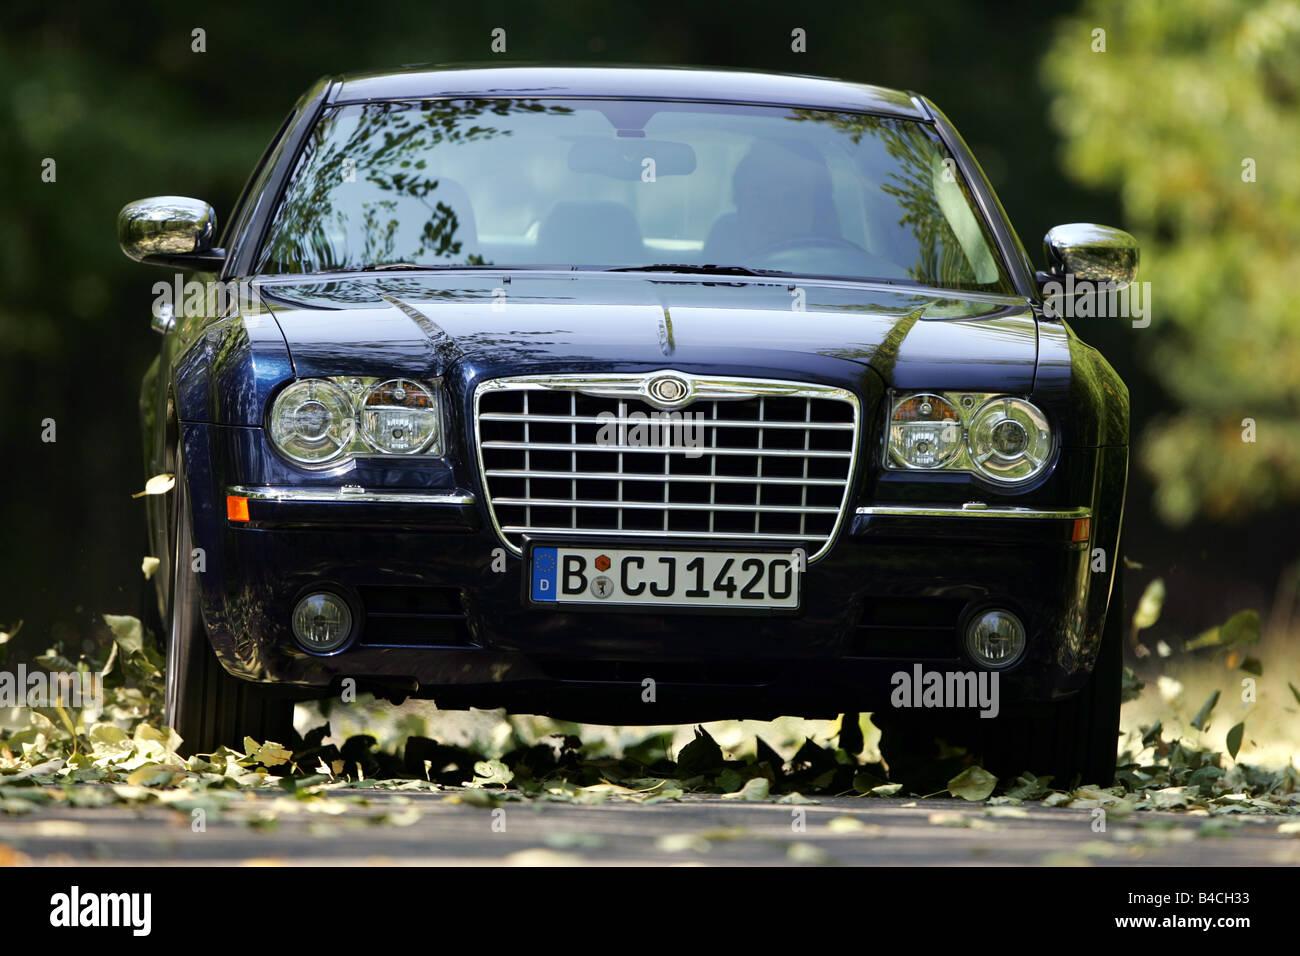 biz mint green union chrysler automotive states photo united yelp hemi with ga first o photos stockbridge of